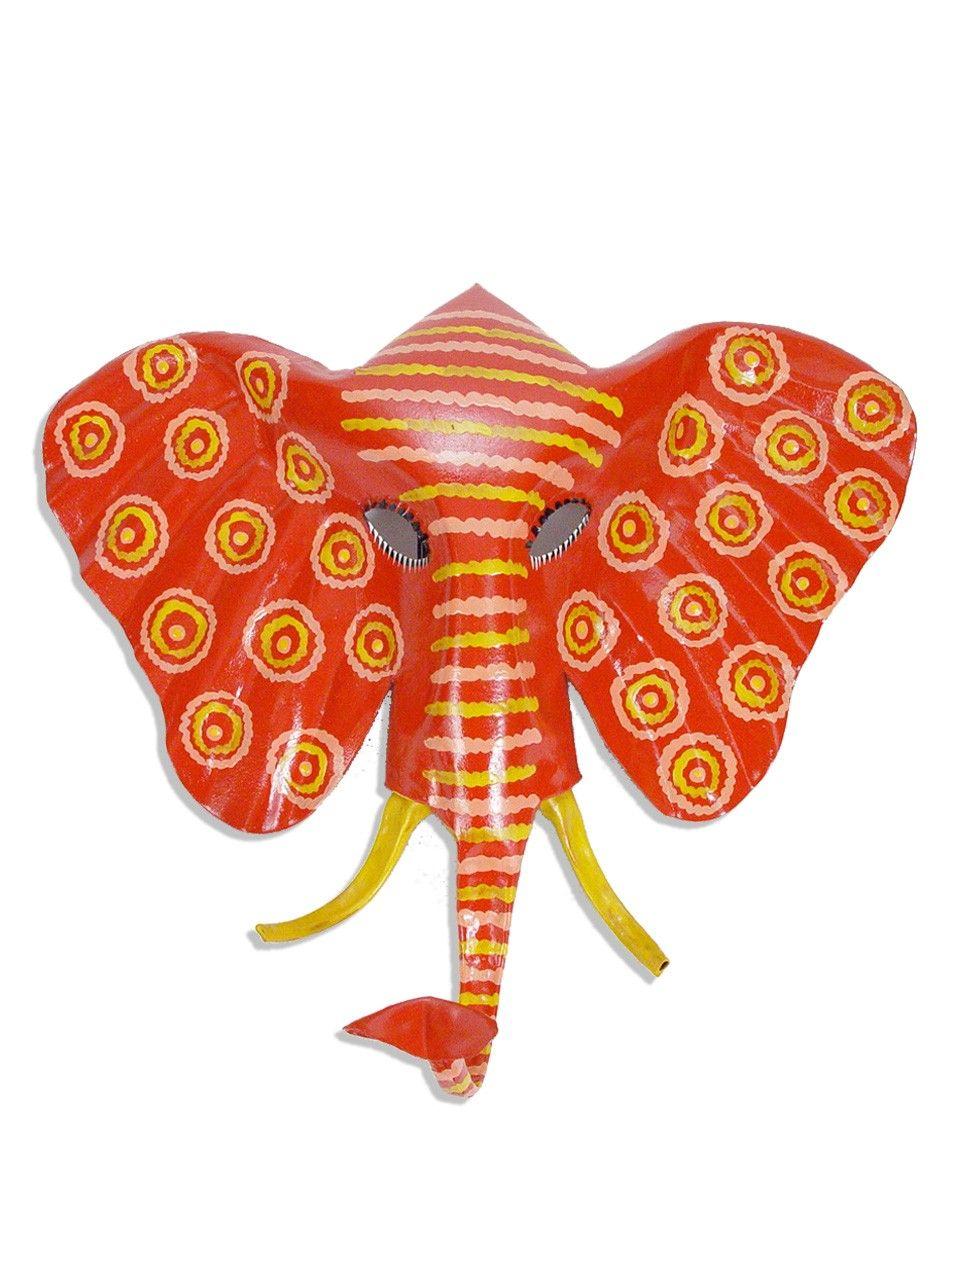 Elephant Masks Hand Painted Colorful Hanging Tin